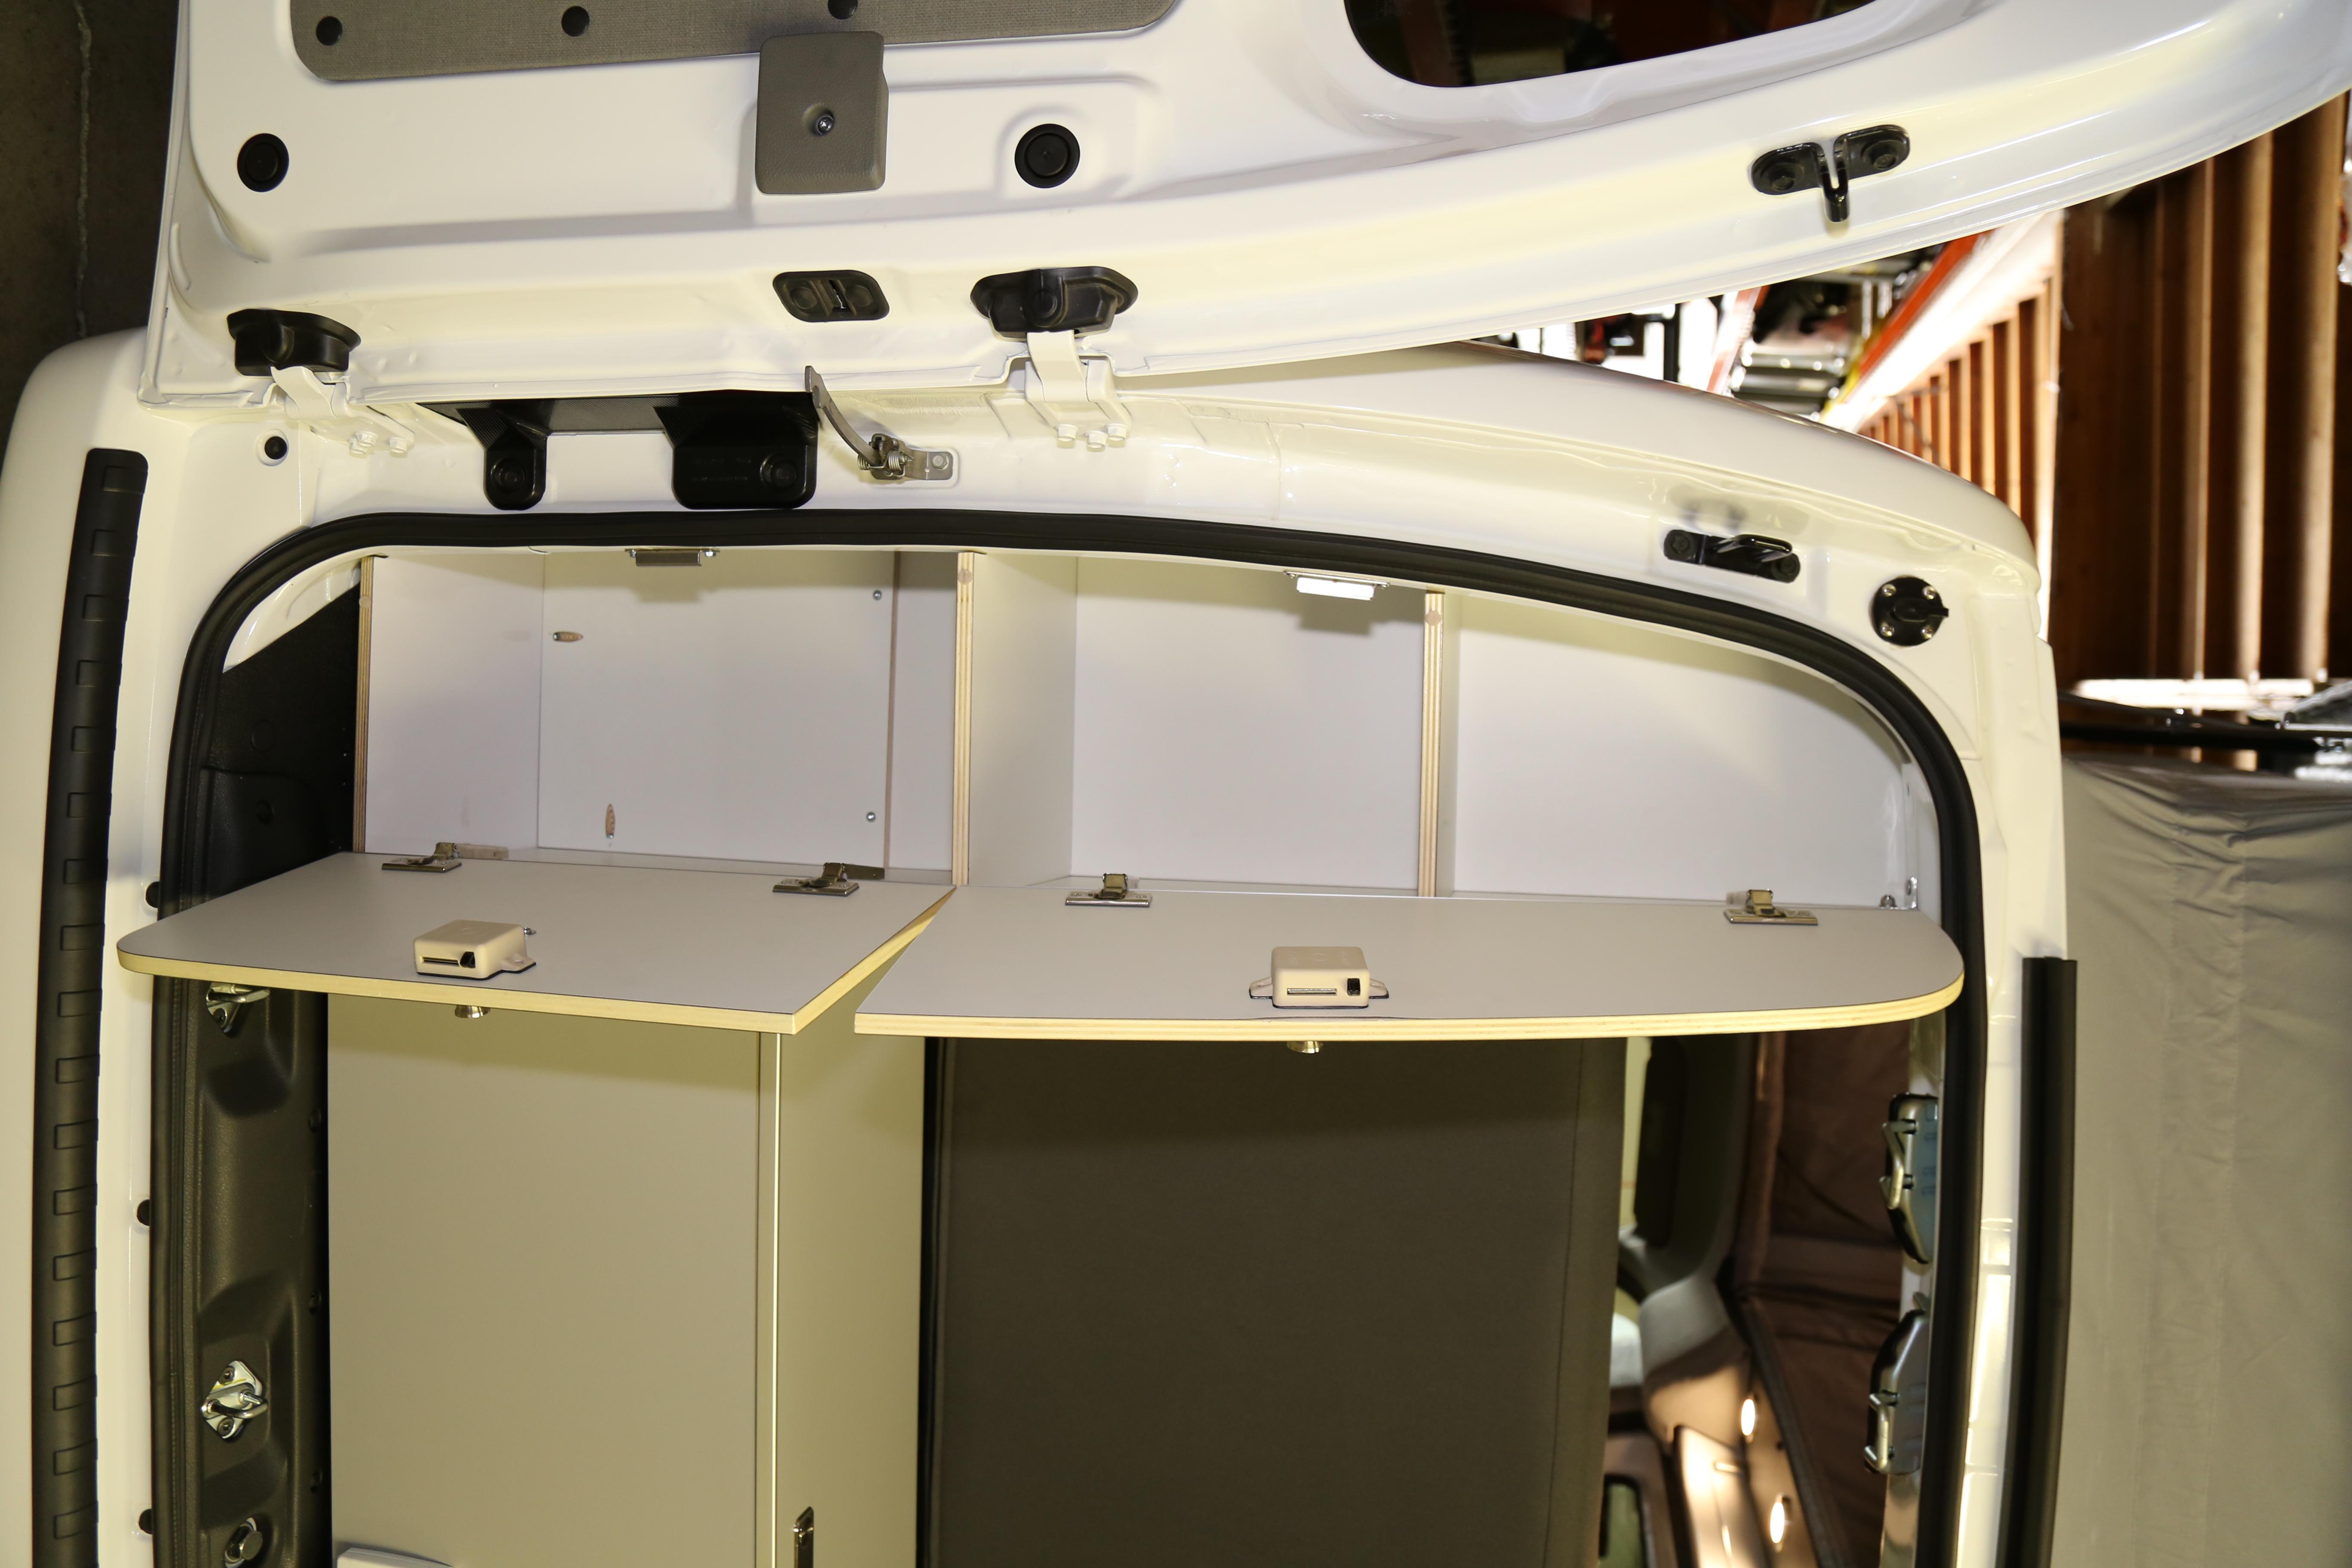 Rear cabinet storage